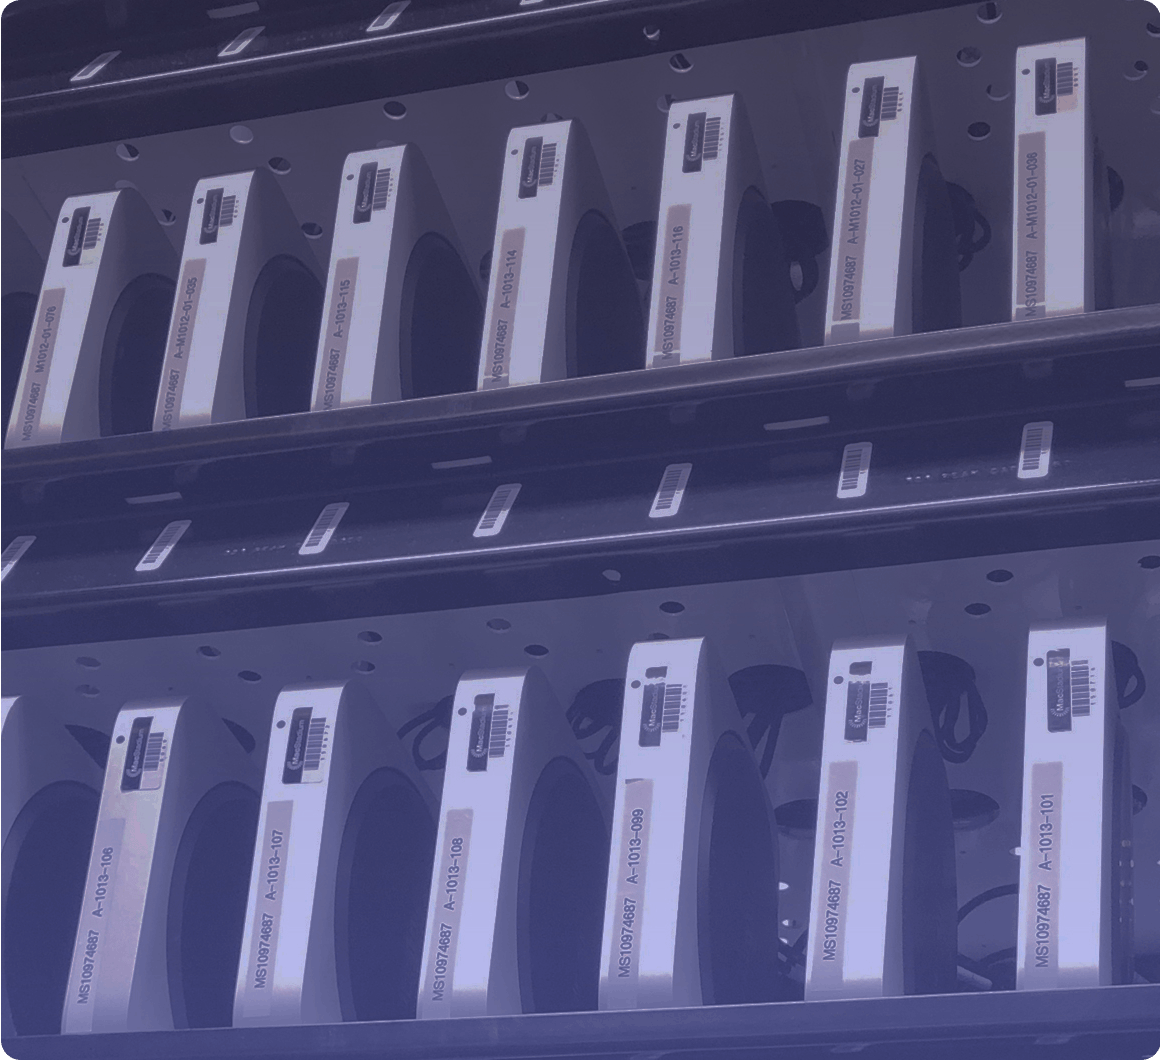 Row of Mac minis